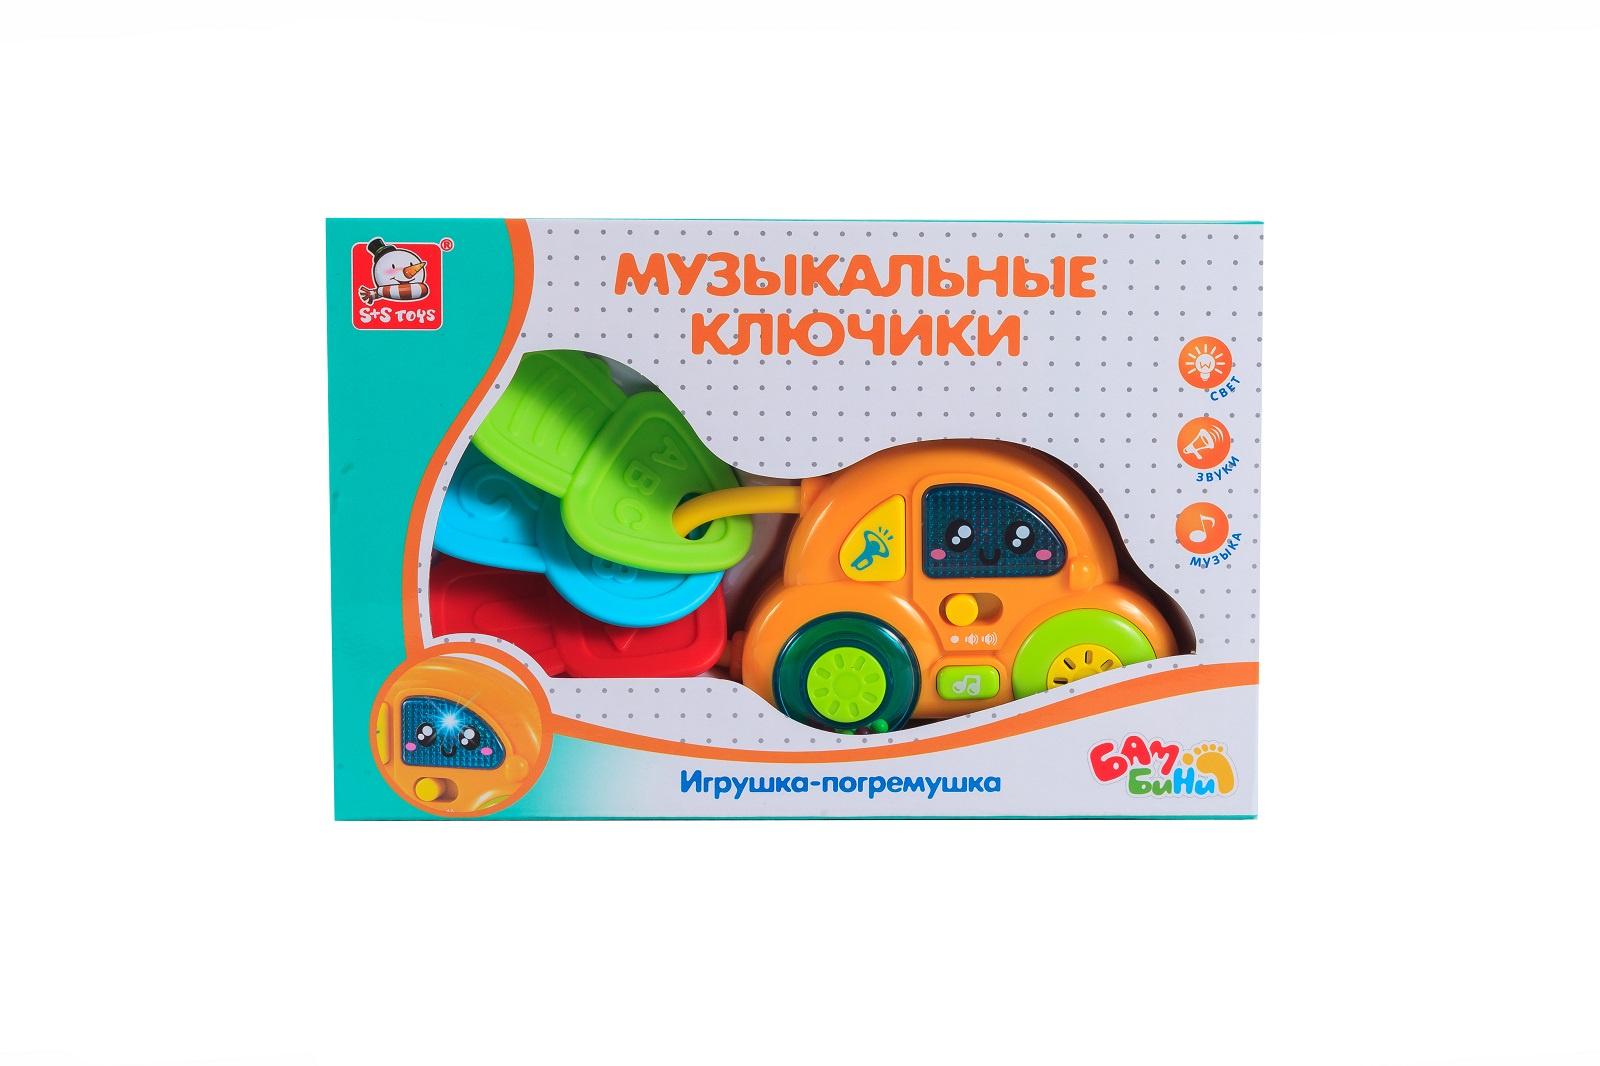 Развивающая игрушка S+S,  Ключики Бамбини, 200061412 развивающая игрушка k s kids ковбой